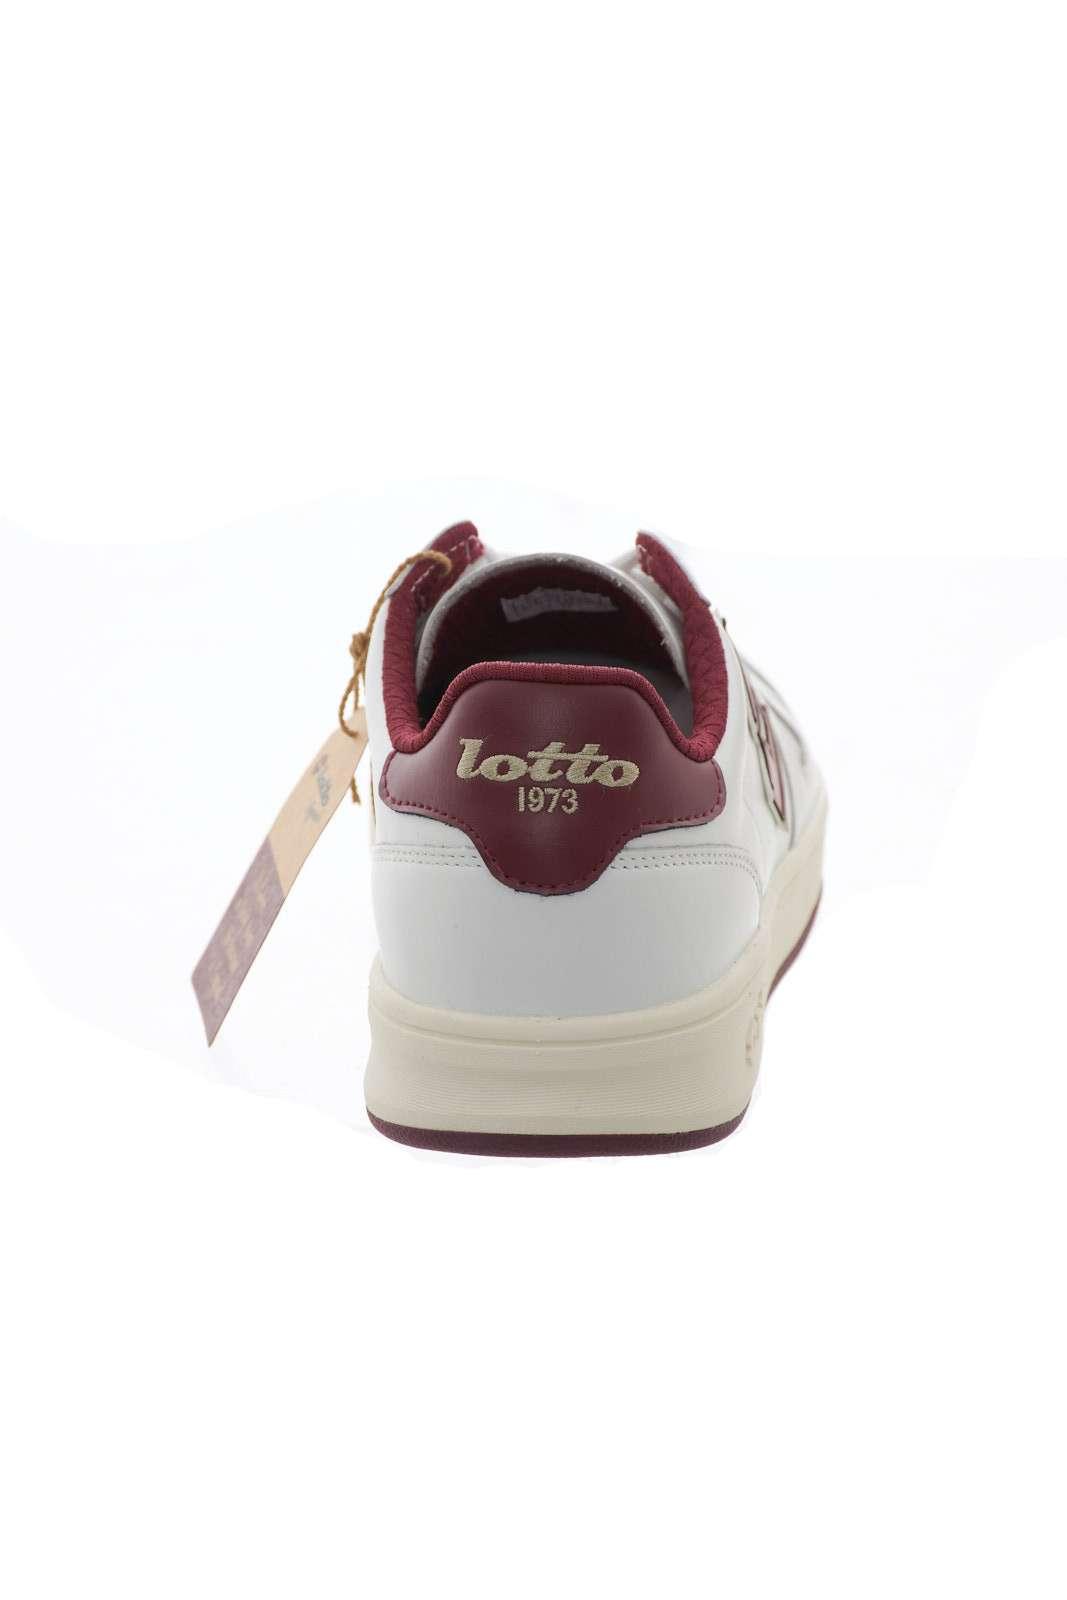 https://www.parmax.com/media/catalog/product/a/i/ai-outlet_parmax-sneaker-lotto-t7379-d_1.jpg